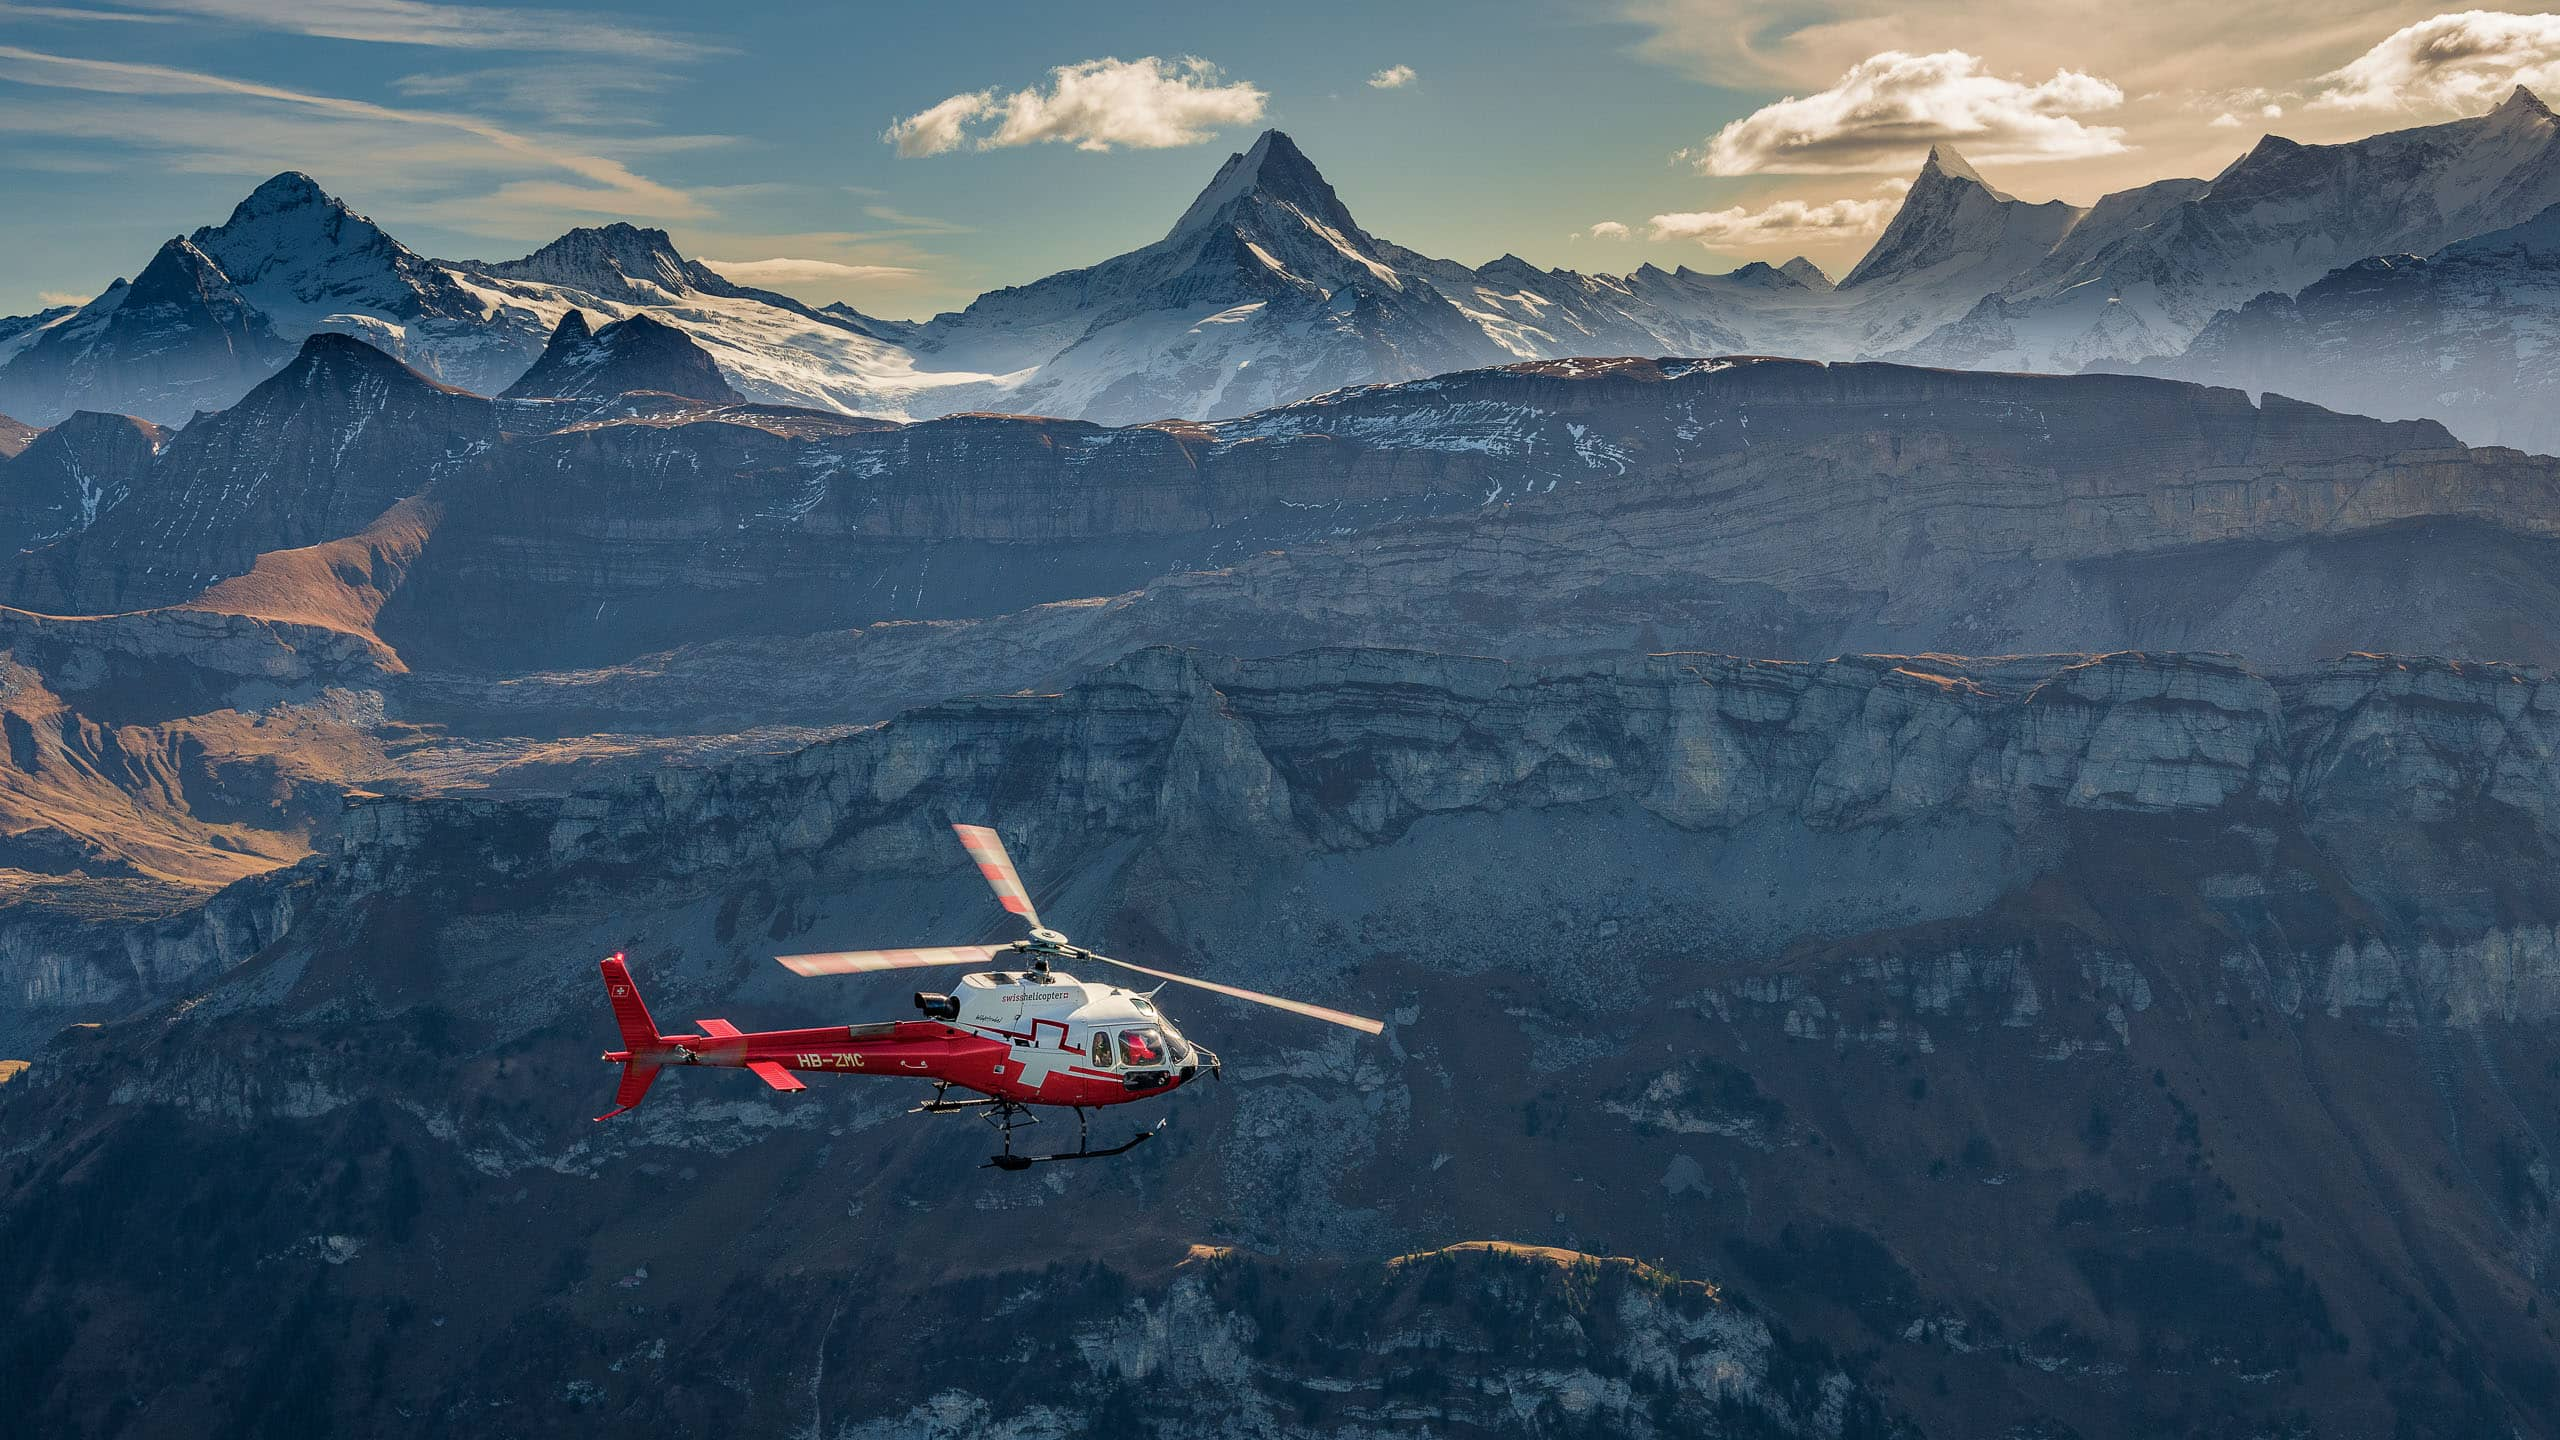 Swiss_Helicopter_Rundflug_Schweiz_Berge_A85_7565